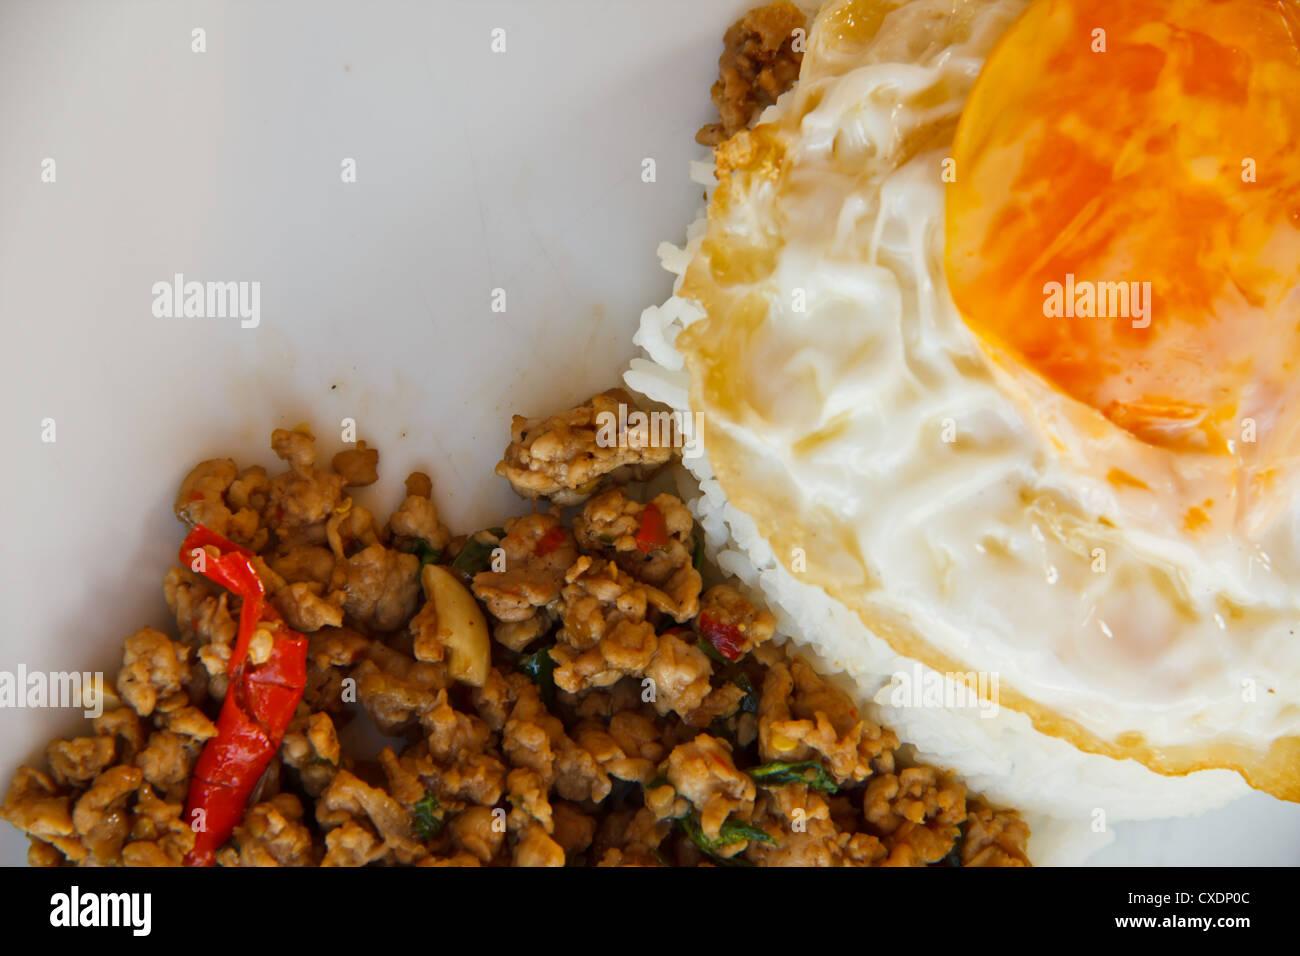 Pad Krapow Moo, spicy stir-fried pork with fried egg and Thai holy basil, Thai cuisine - Stock Image